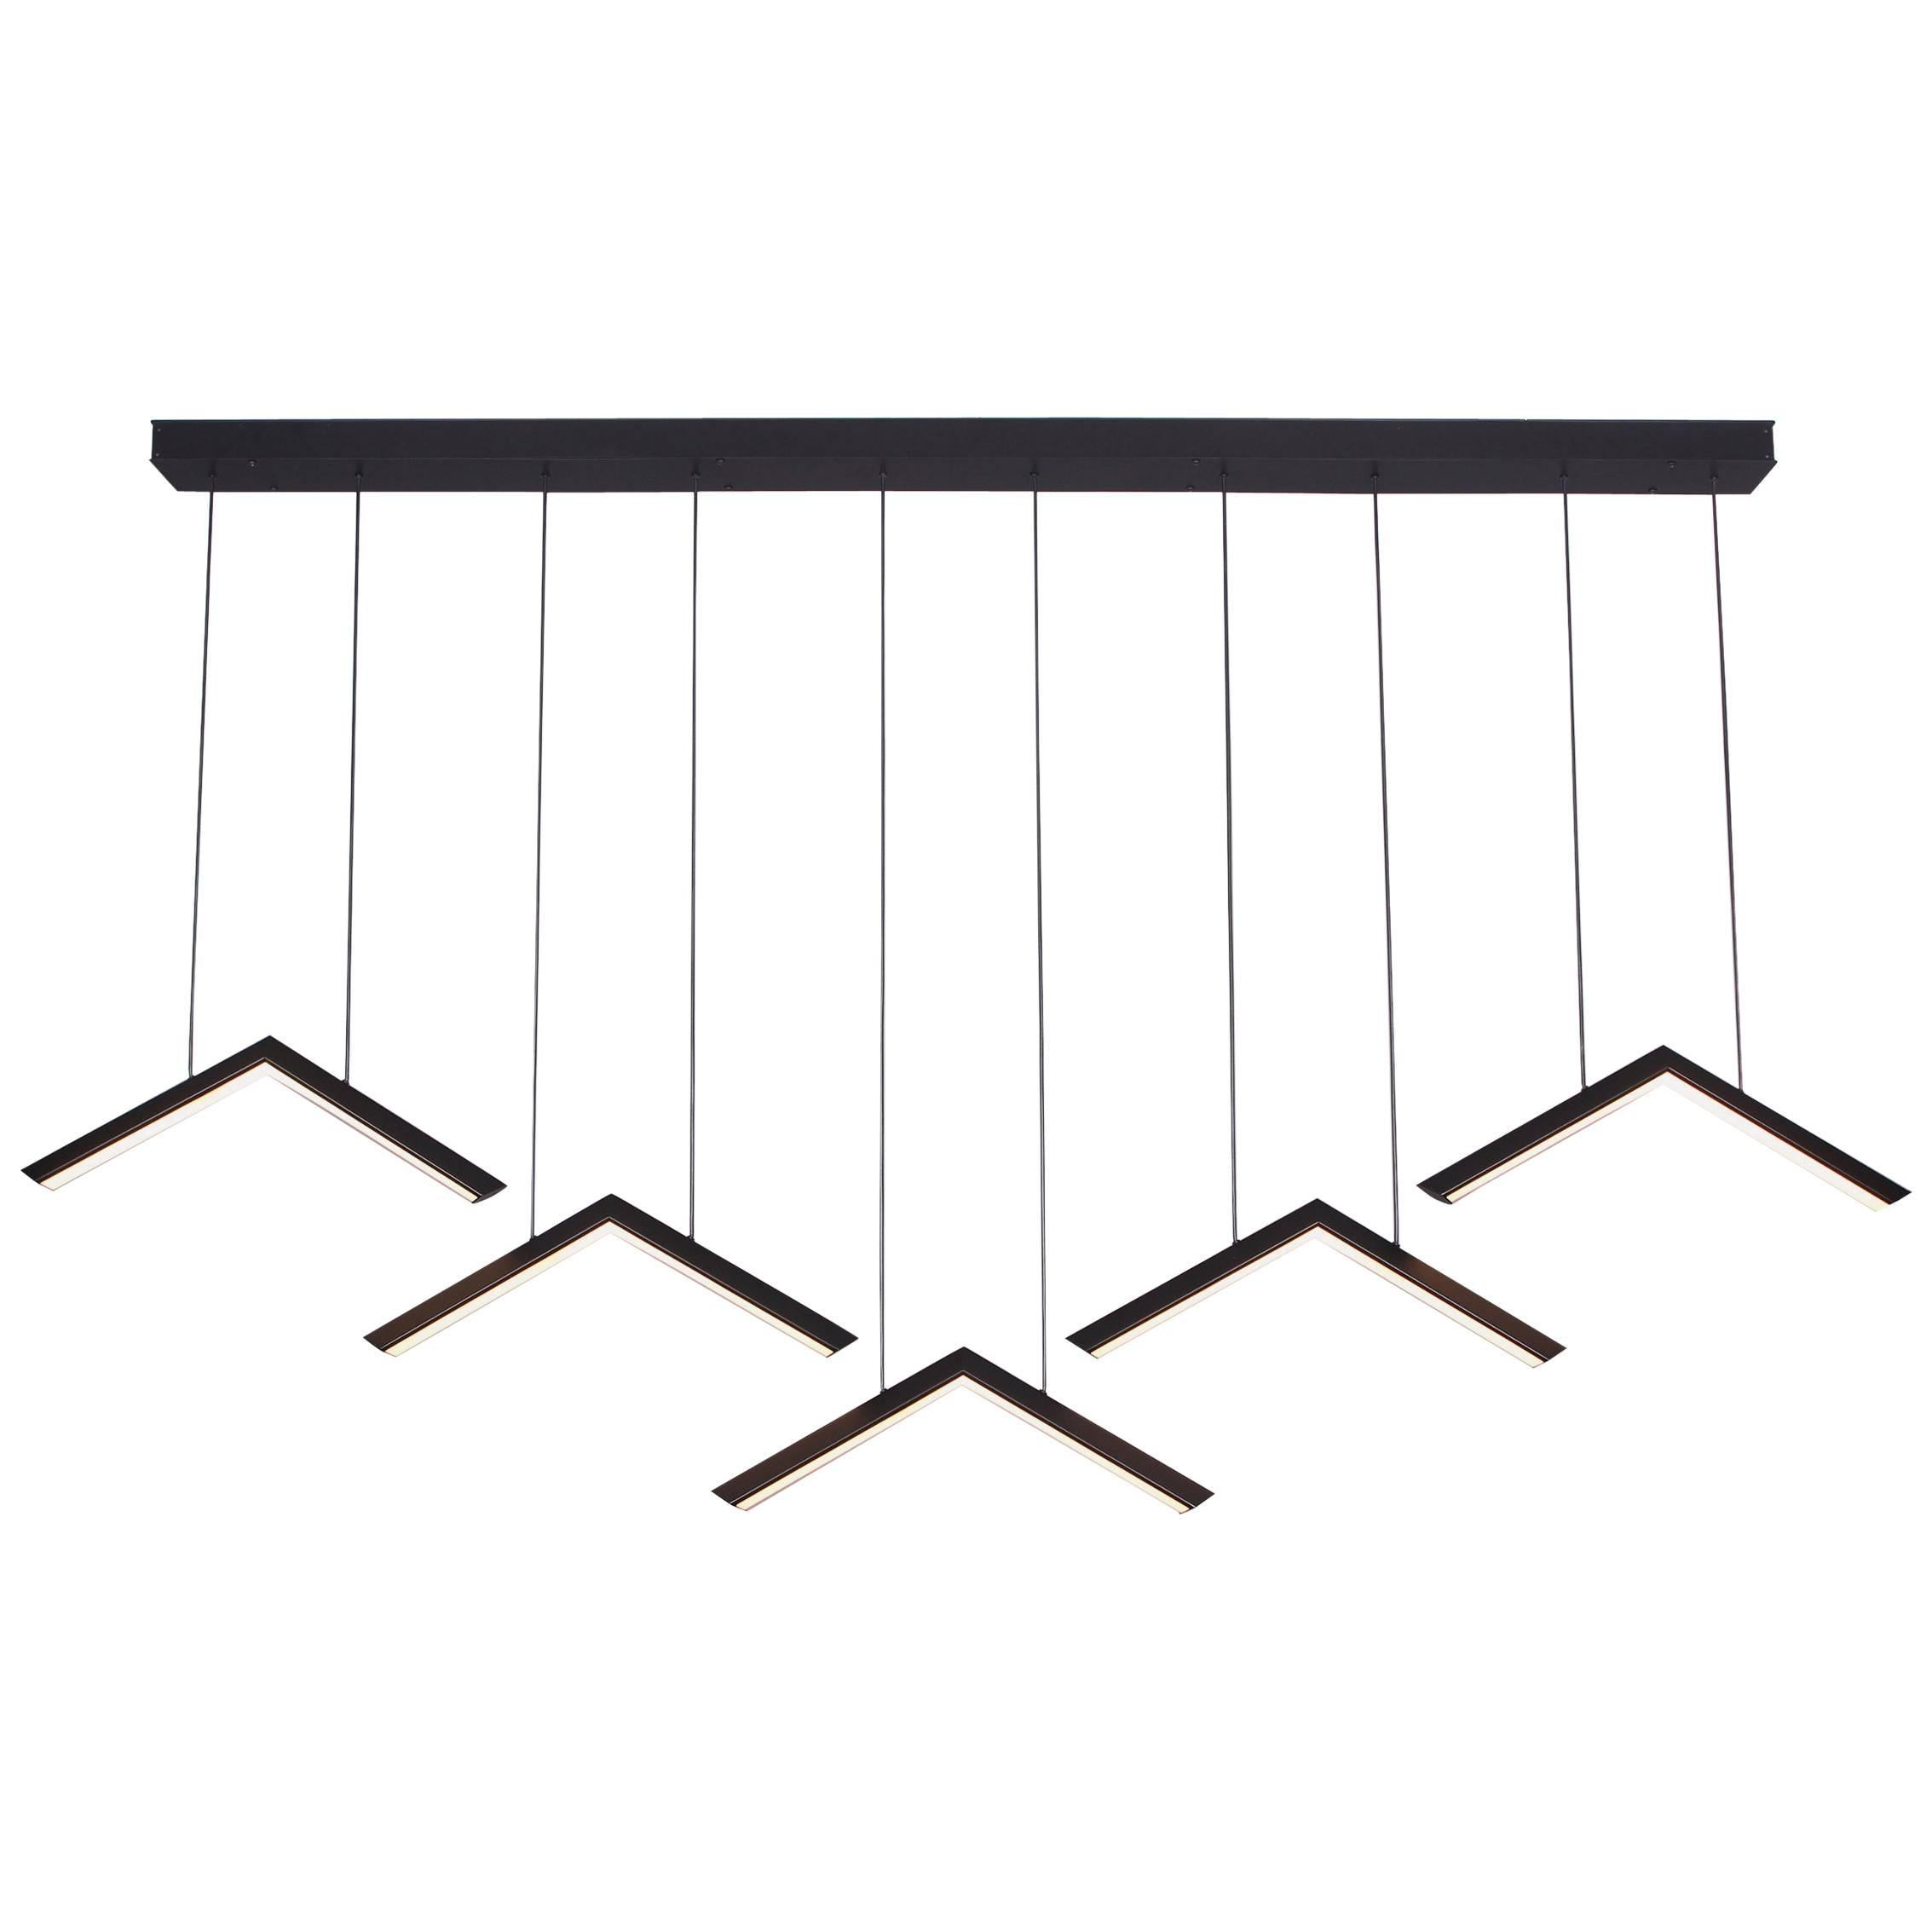 ALPINE V - Black Geometric Modern LED Linear Chandelier Light Fixture